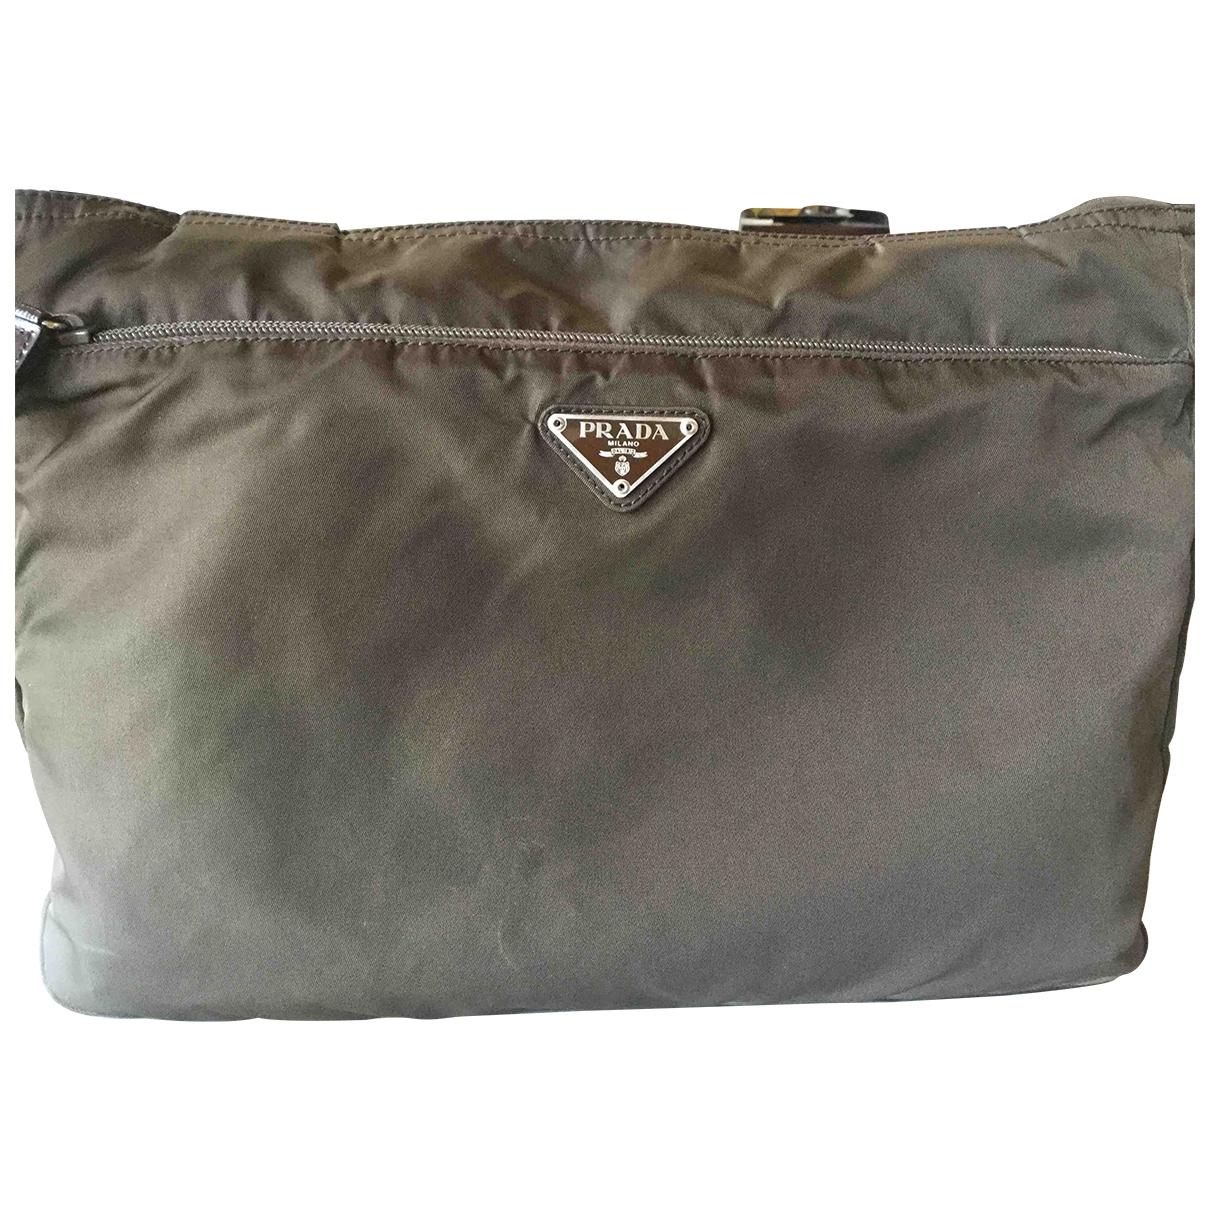 Prada \N Brown handbag for Women \N